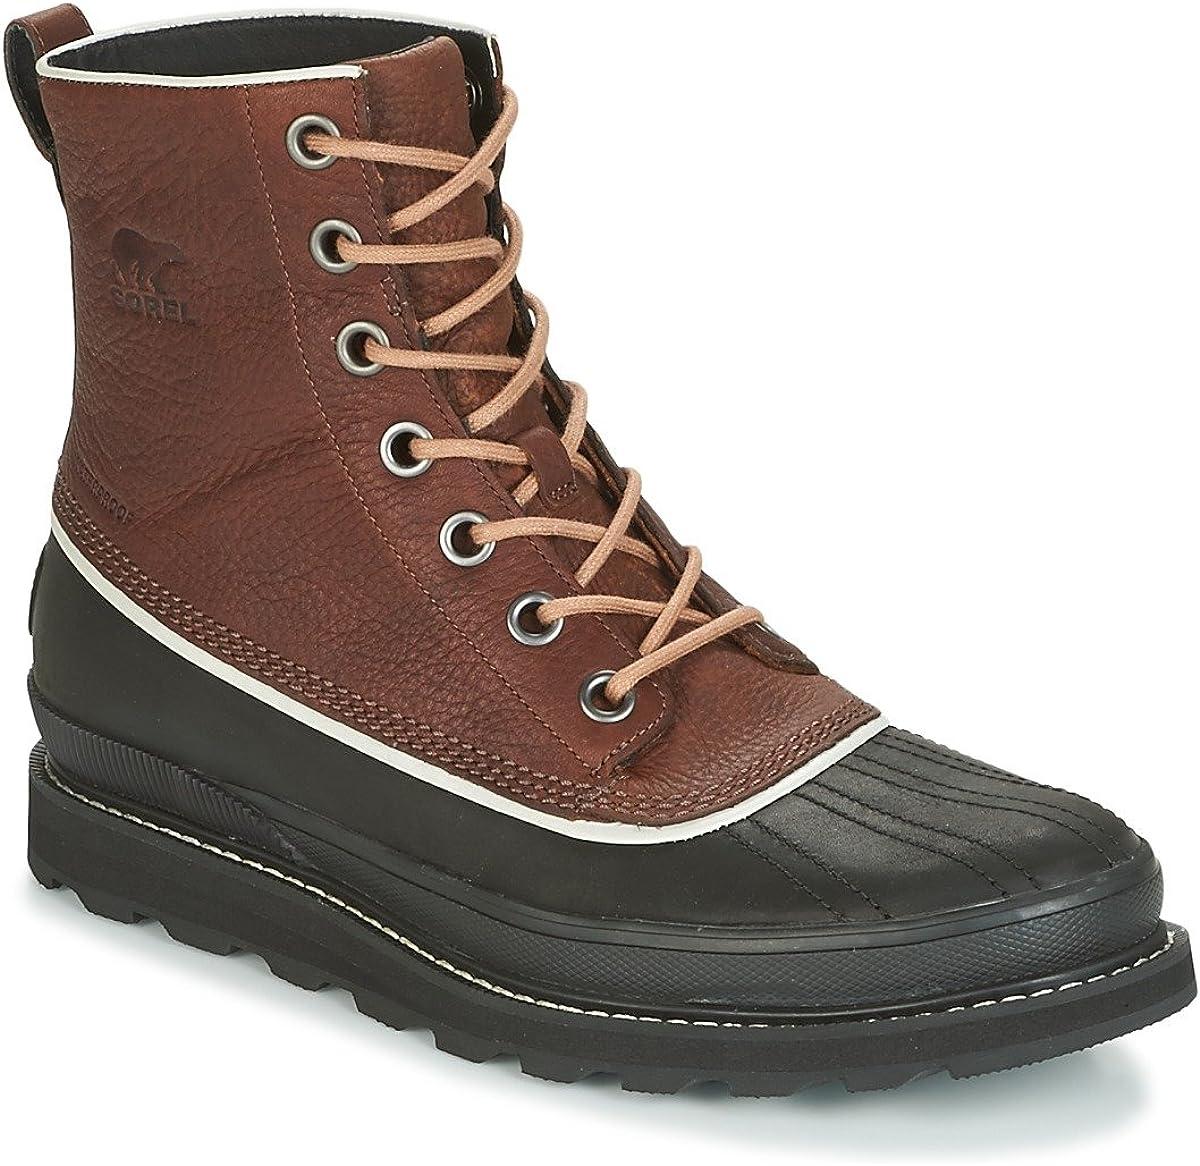 Sorel Madson trust 1964 Men's Popular standard Waterproof Boots